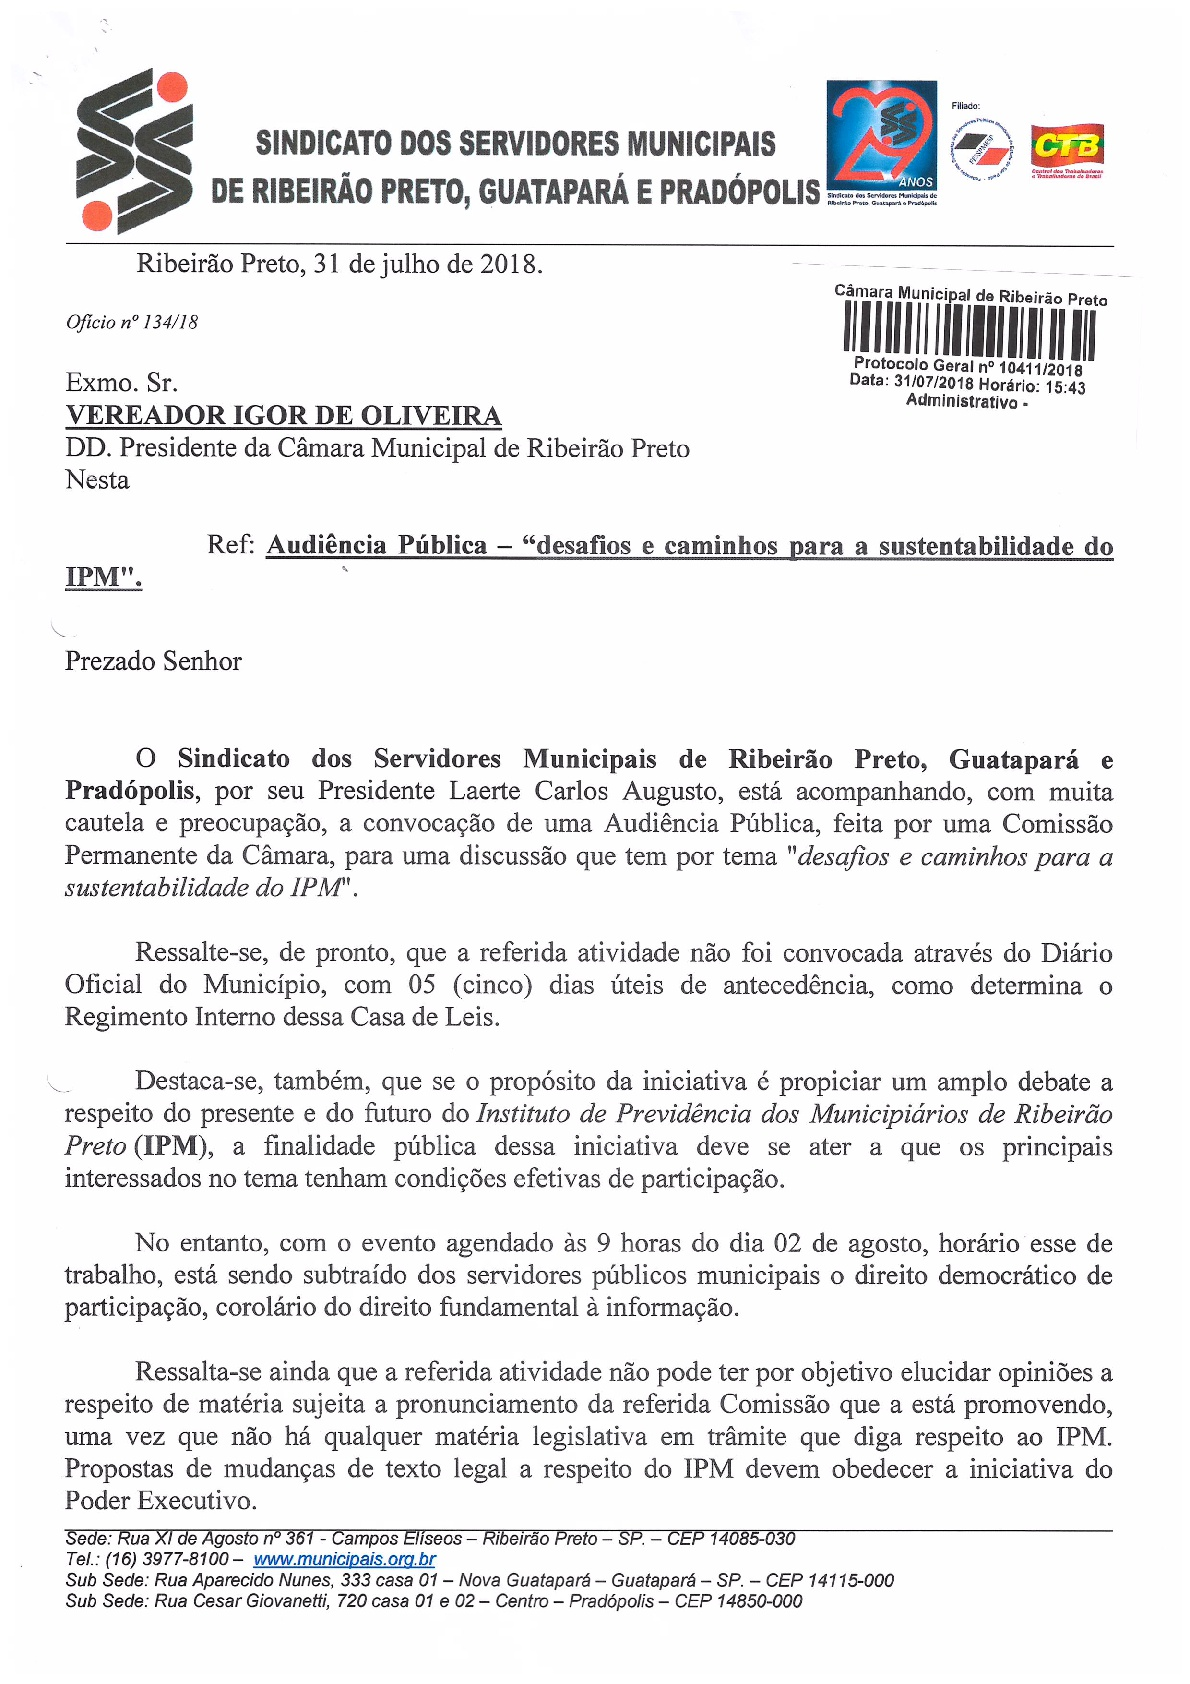 Protocolo-Camara-Audiencia-IPM-001